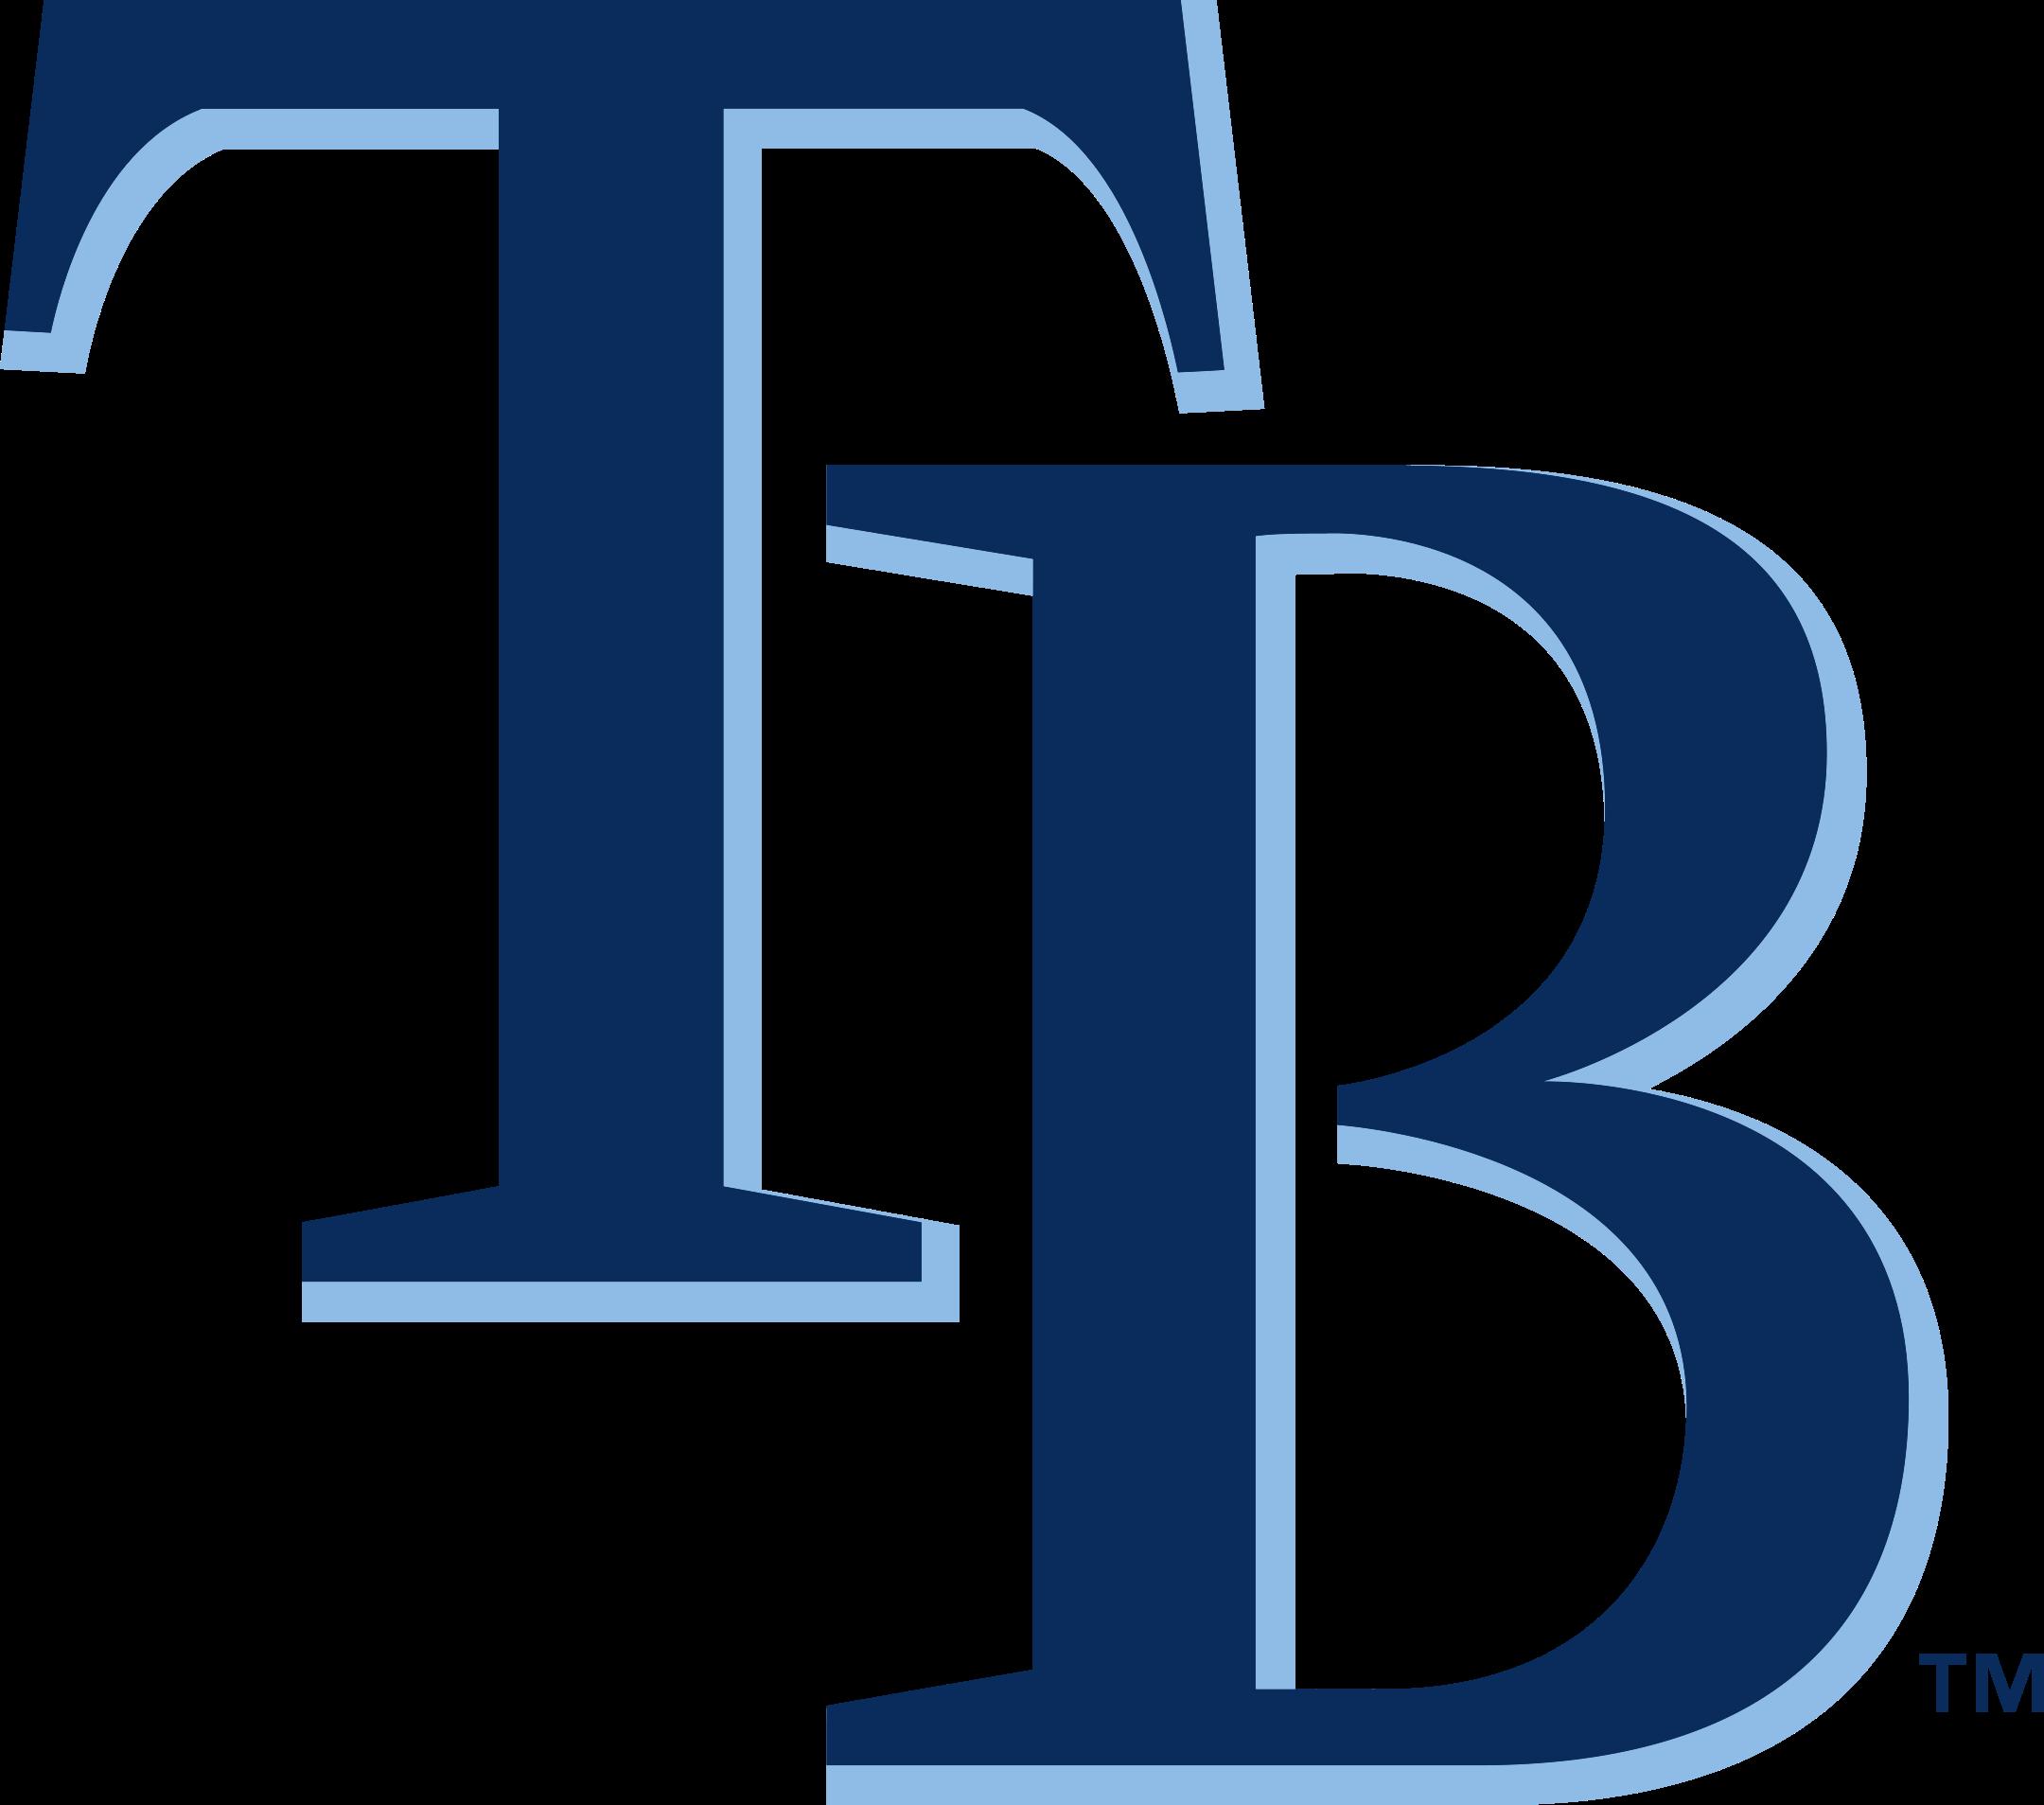 tampa bay rays logo 1 - Tampa Bay Rays Logo